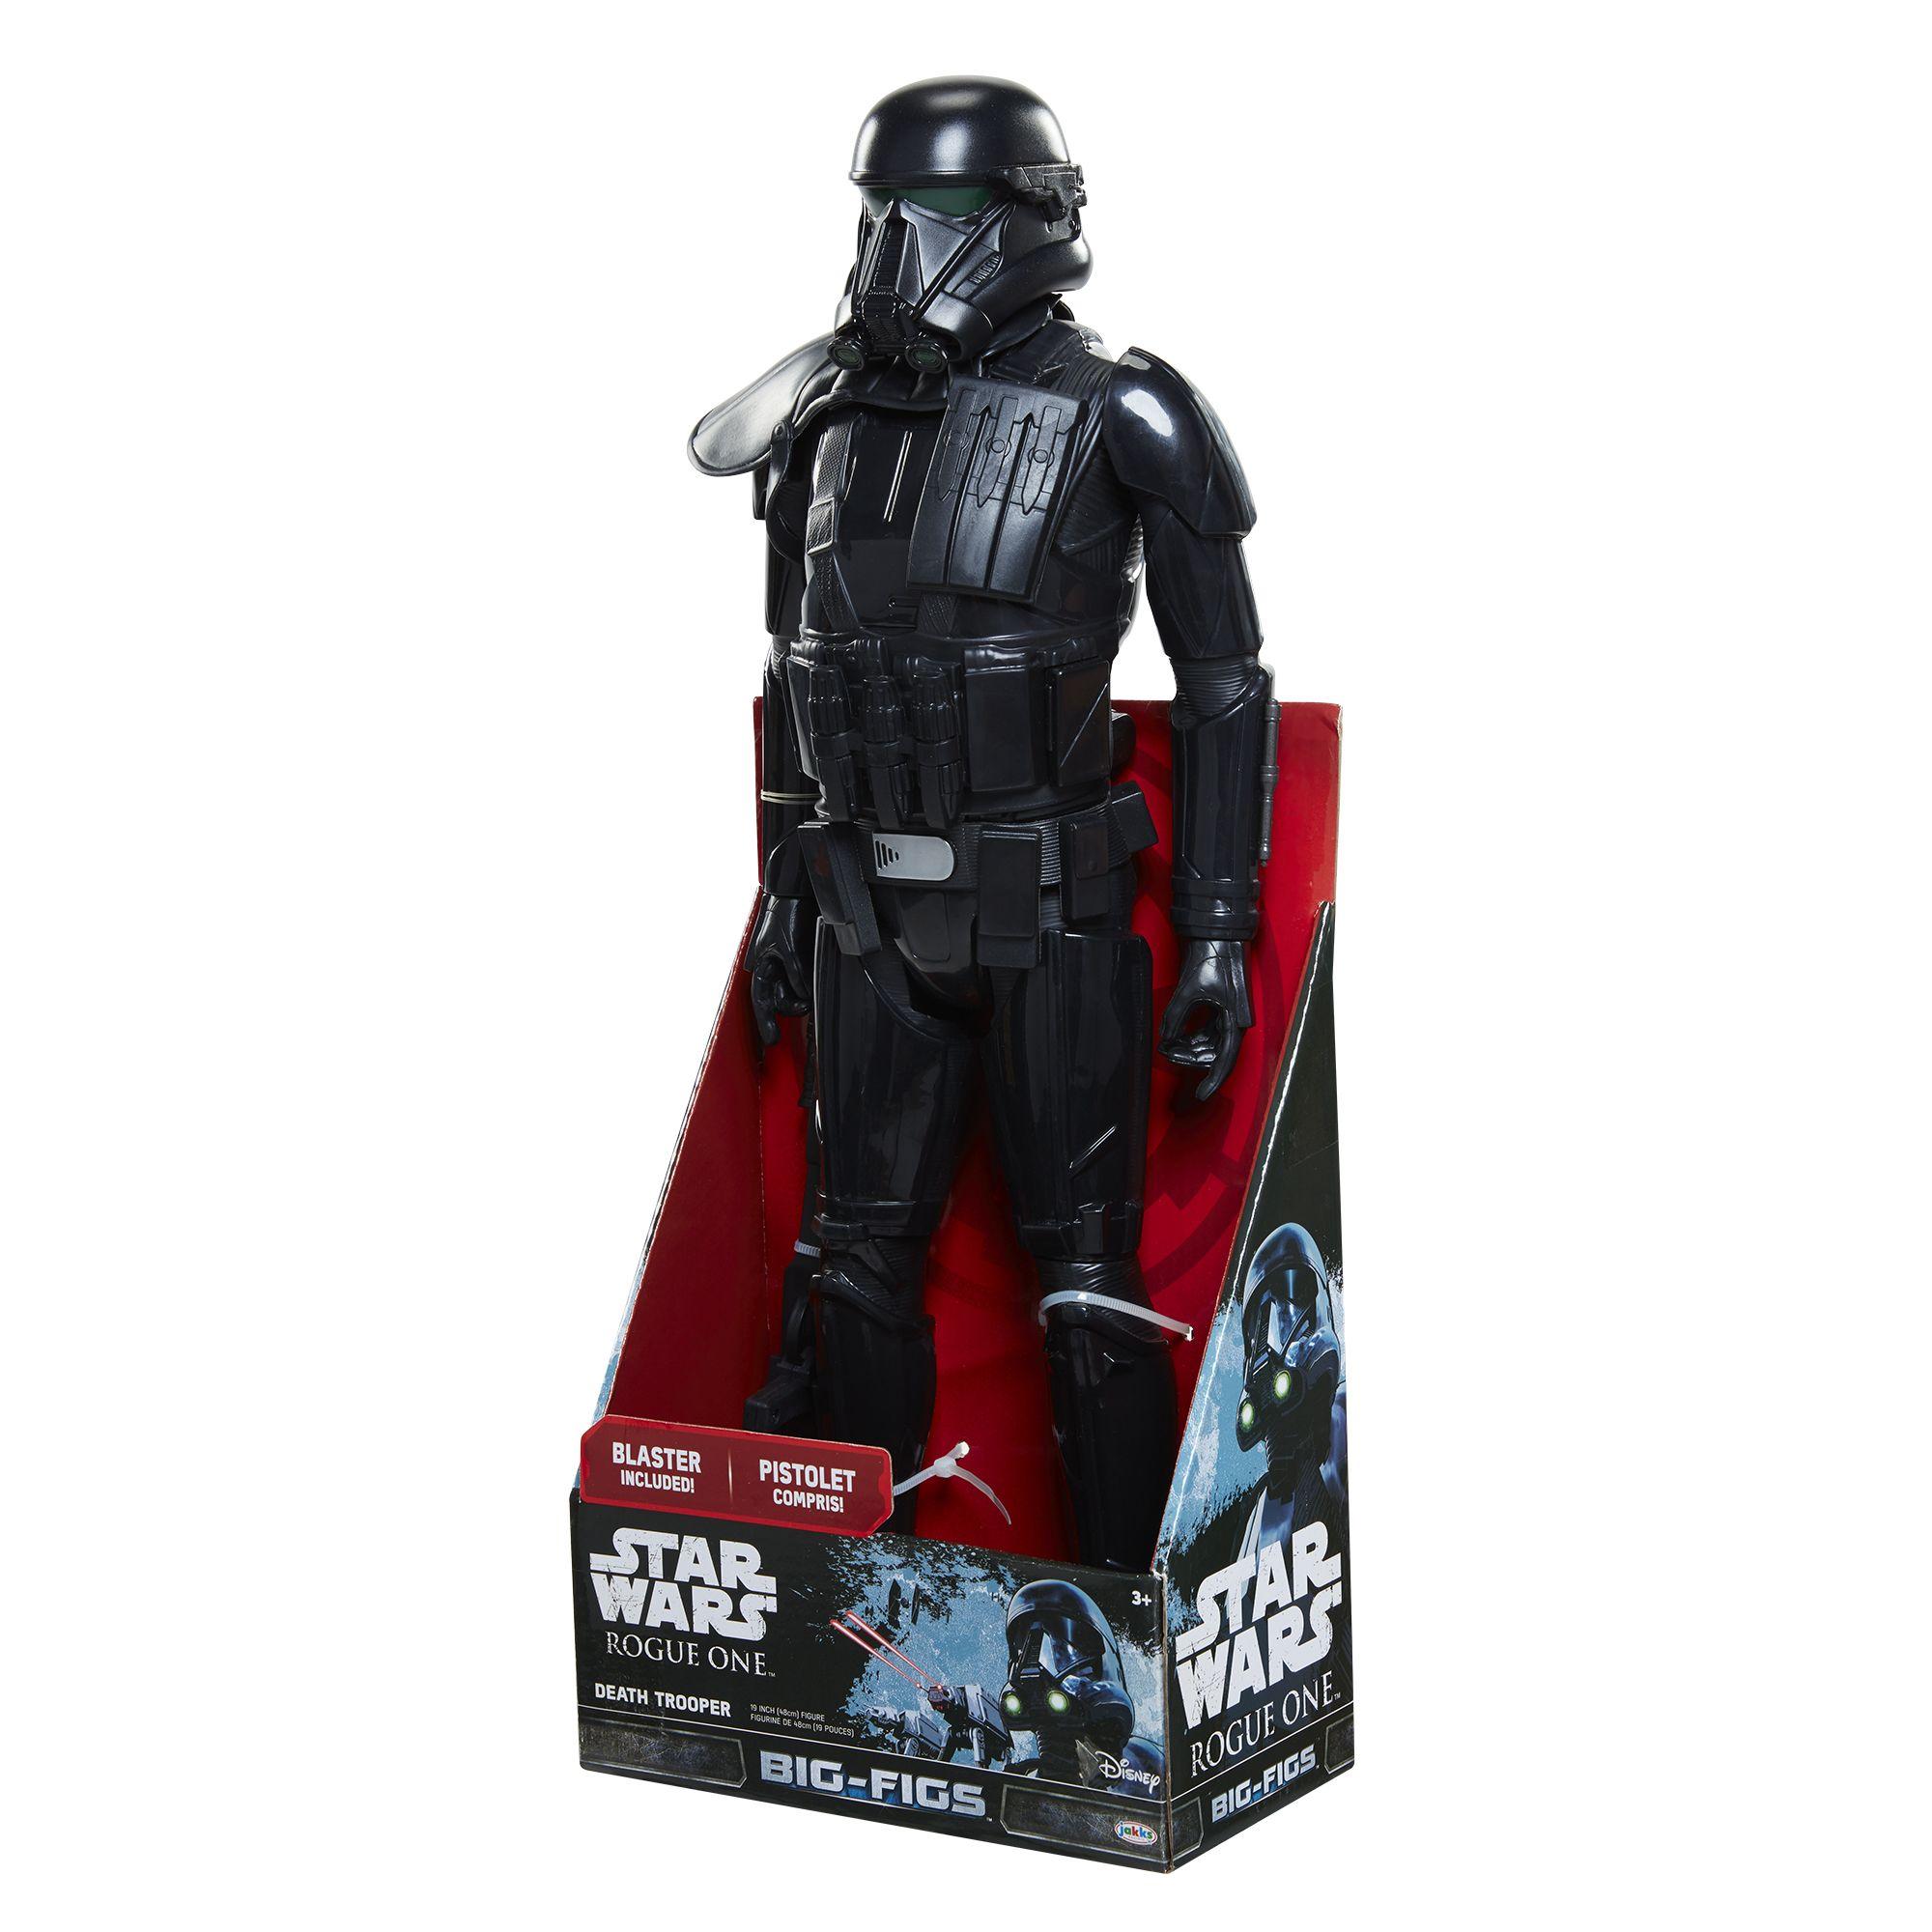 Jakks Pacific Reveals Rogue One Figures: Star Wars: Rogue One 31-Inch Figures STORMTROOPER, K2-SO